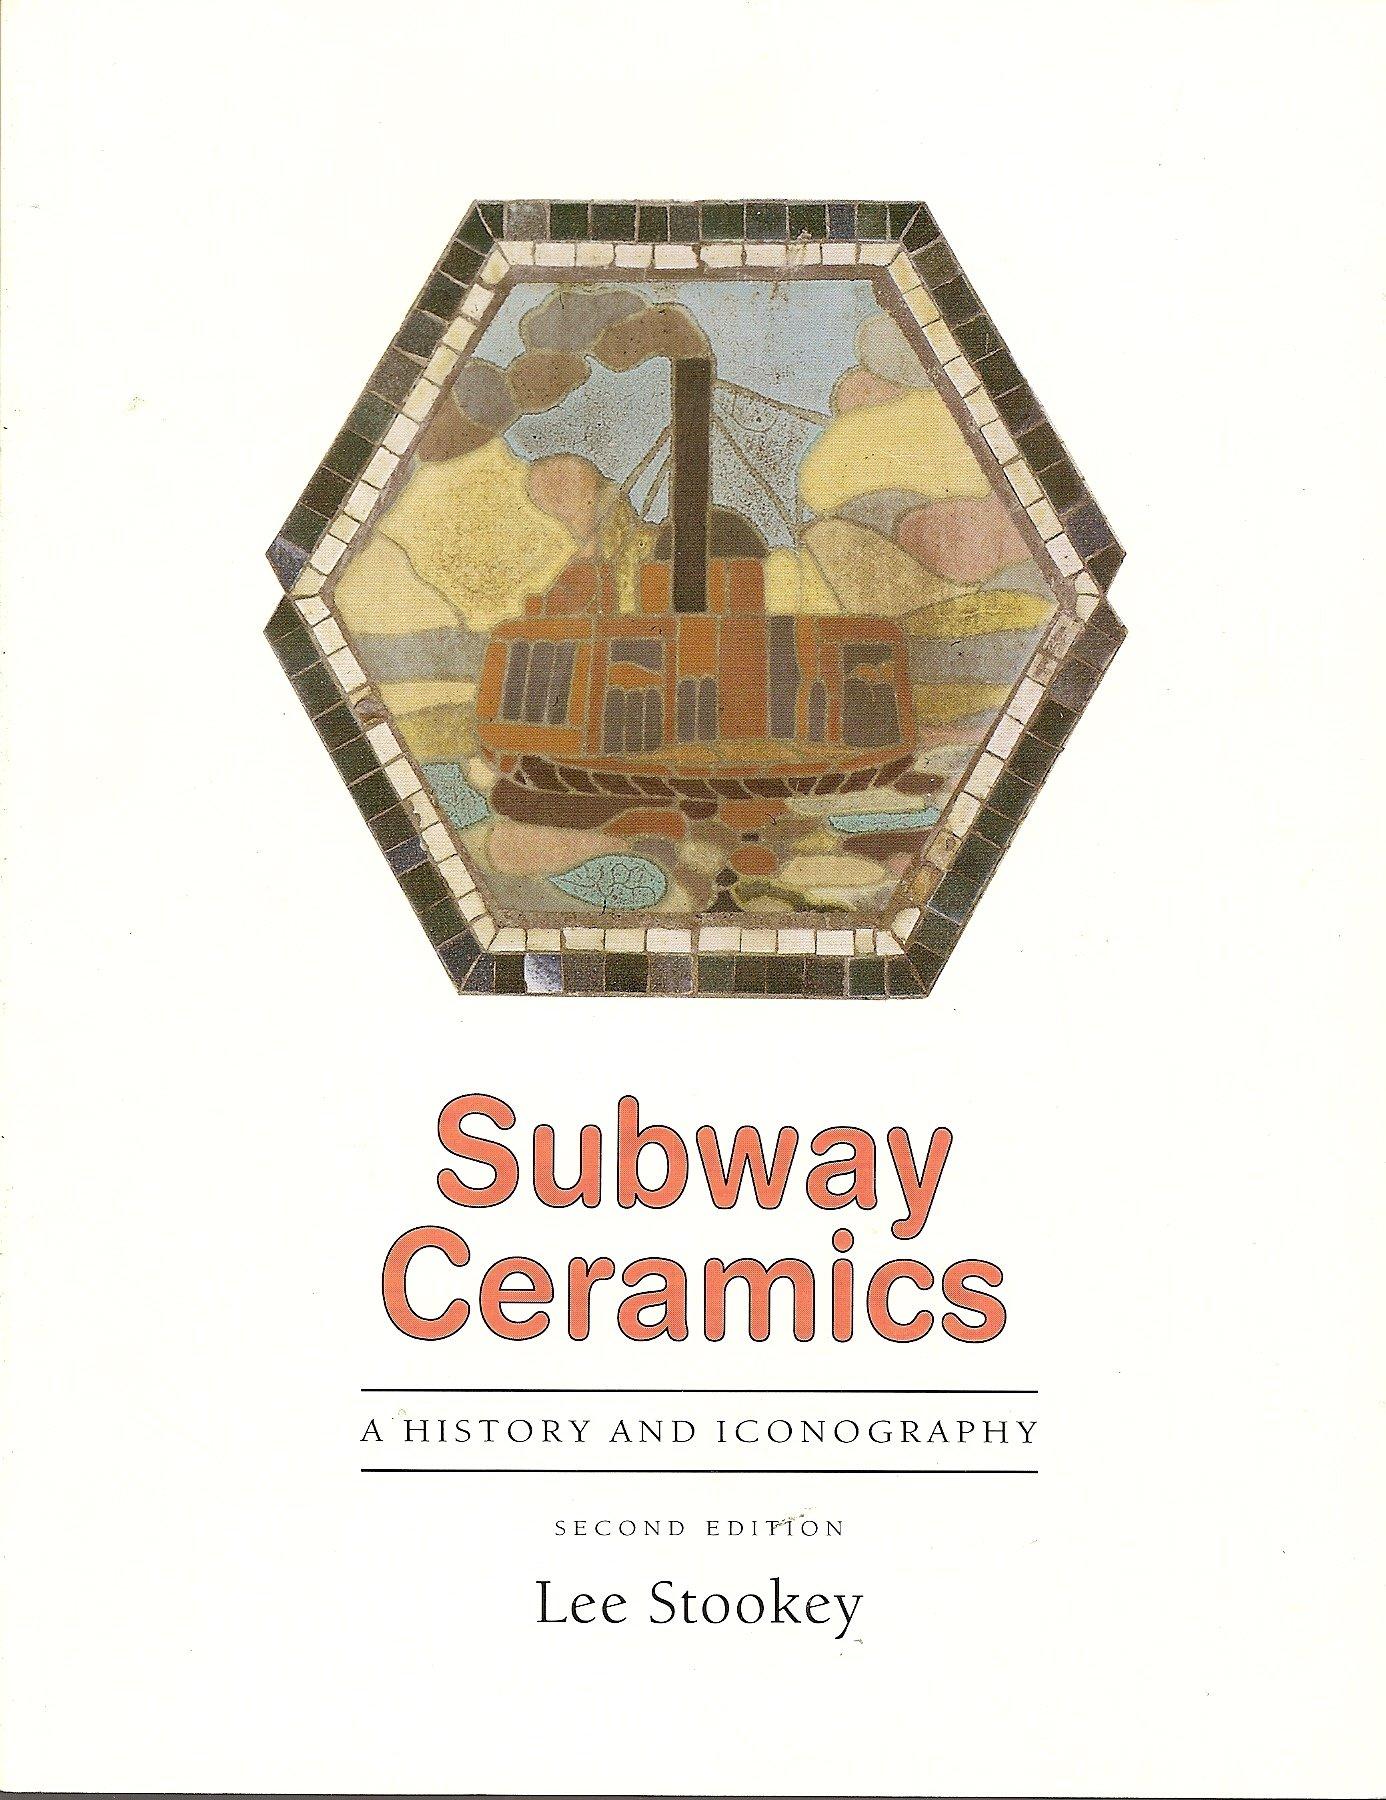 Ceramics History Books Subway Ceramics a History